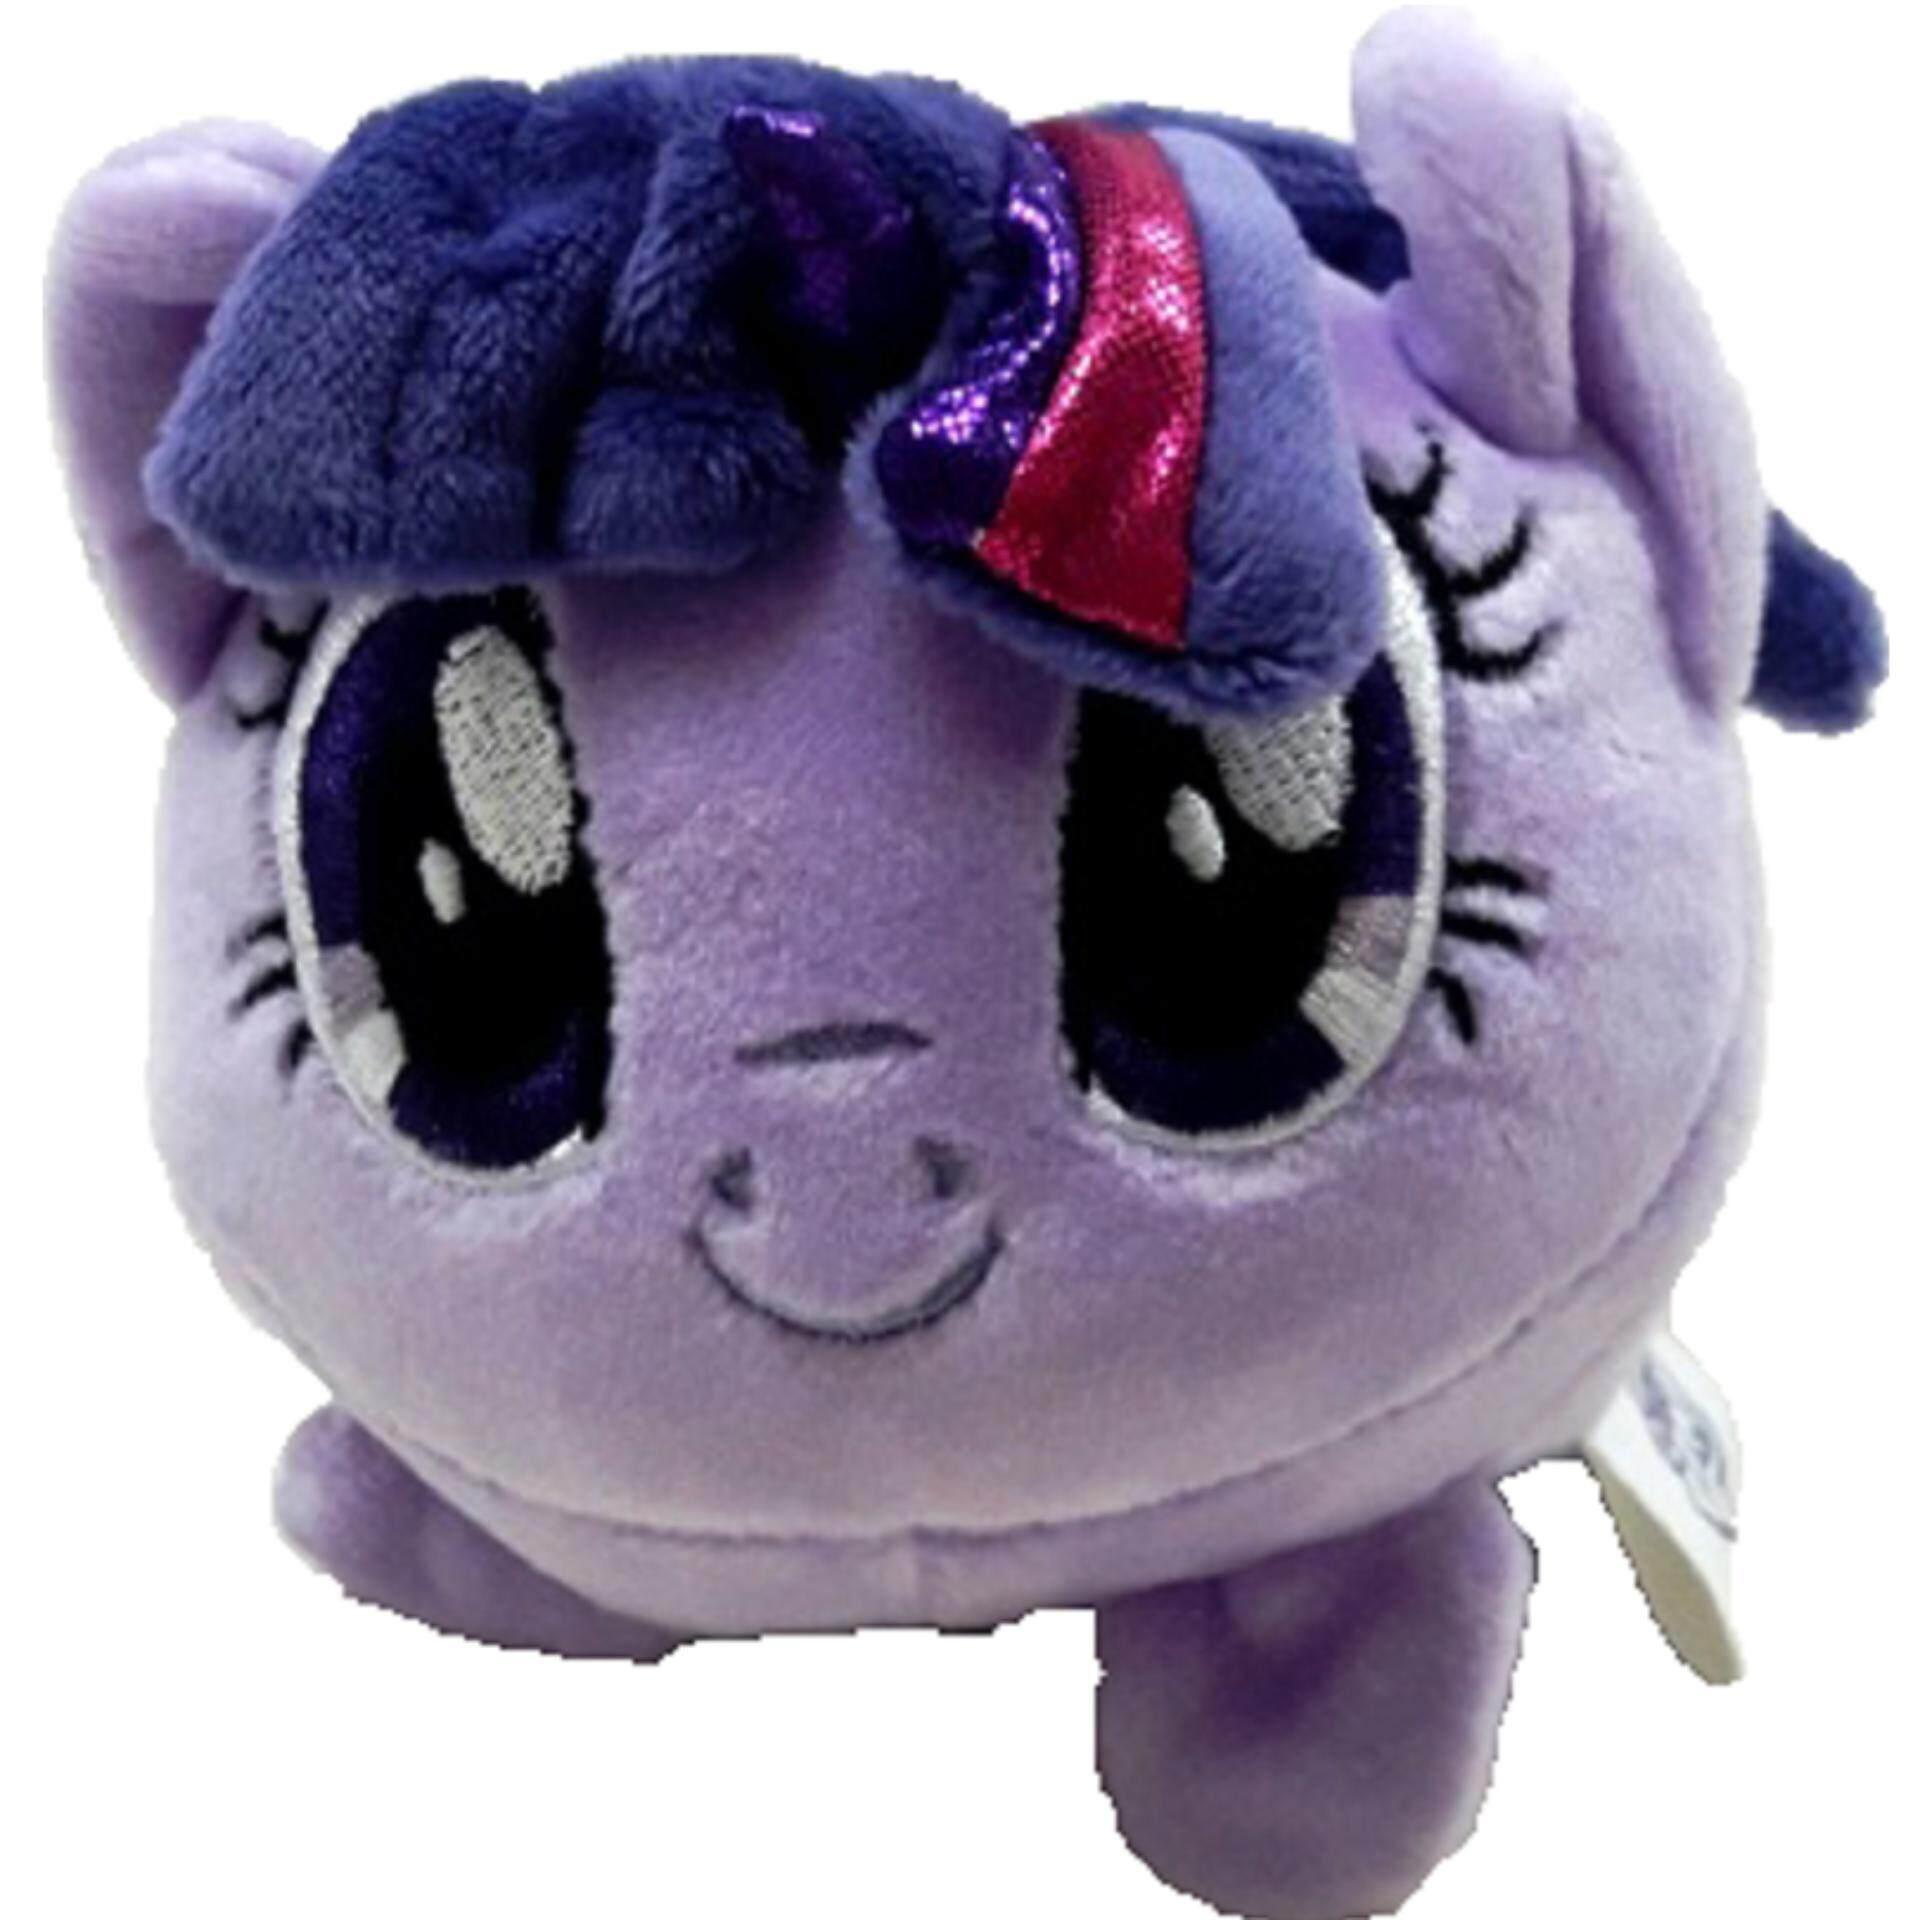 My Little Pony Cutie Plush Toy - Twilight Sparkle toys for girls